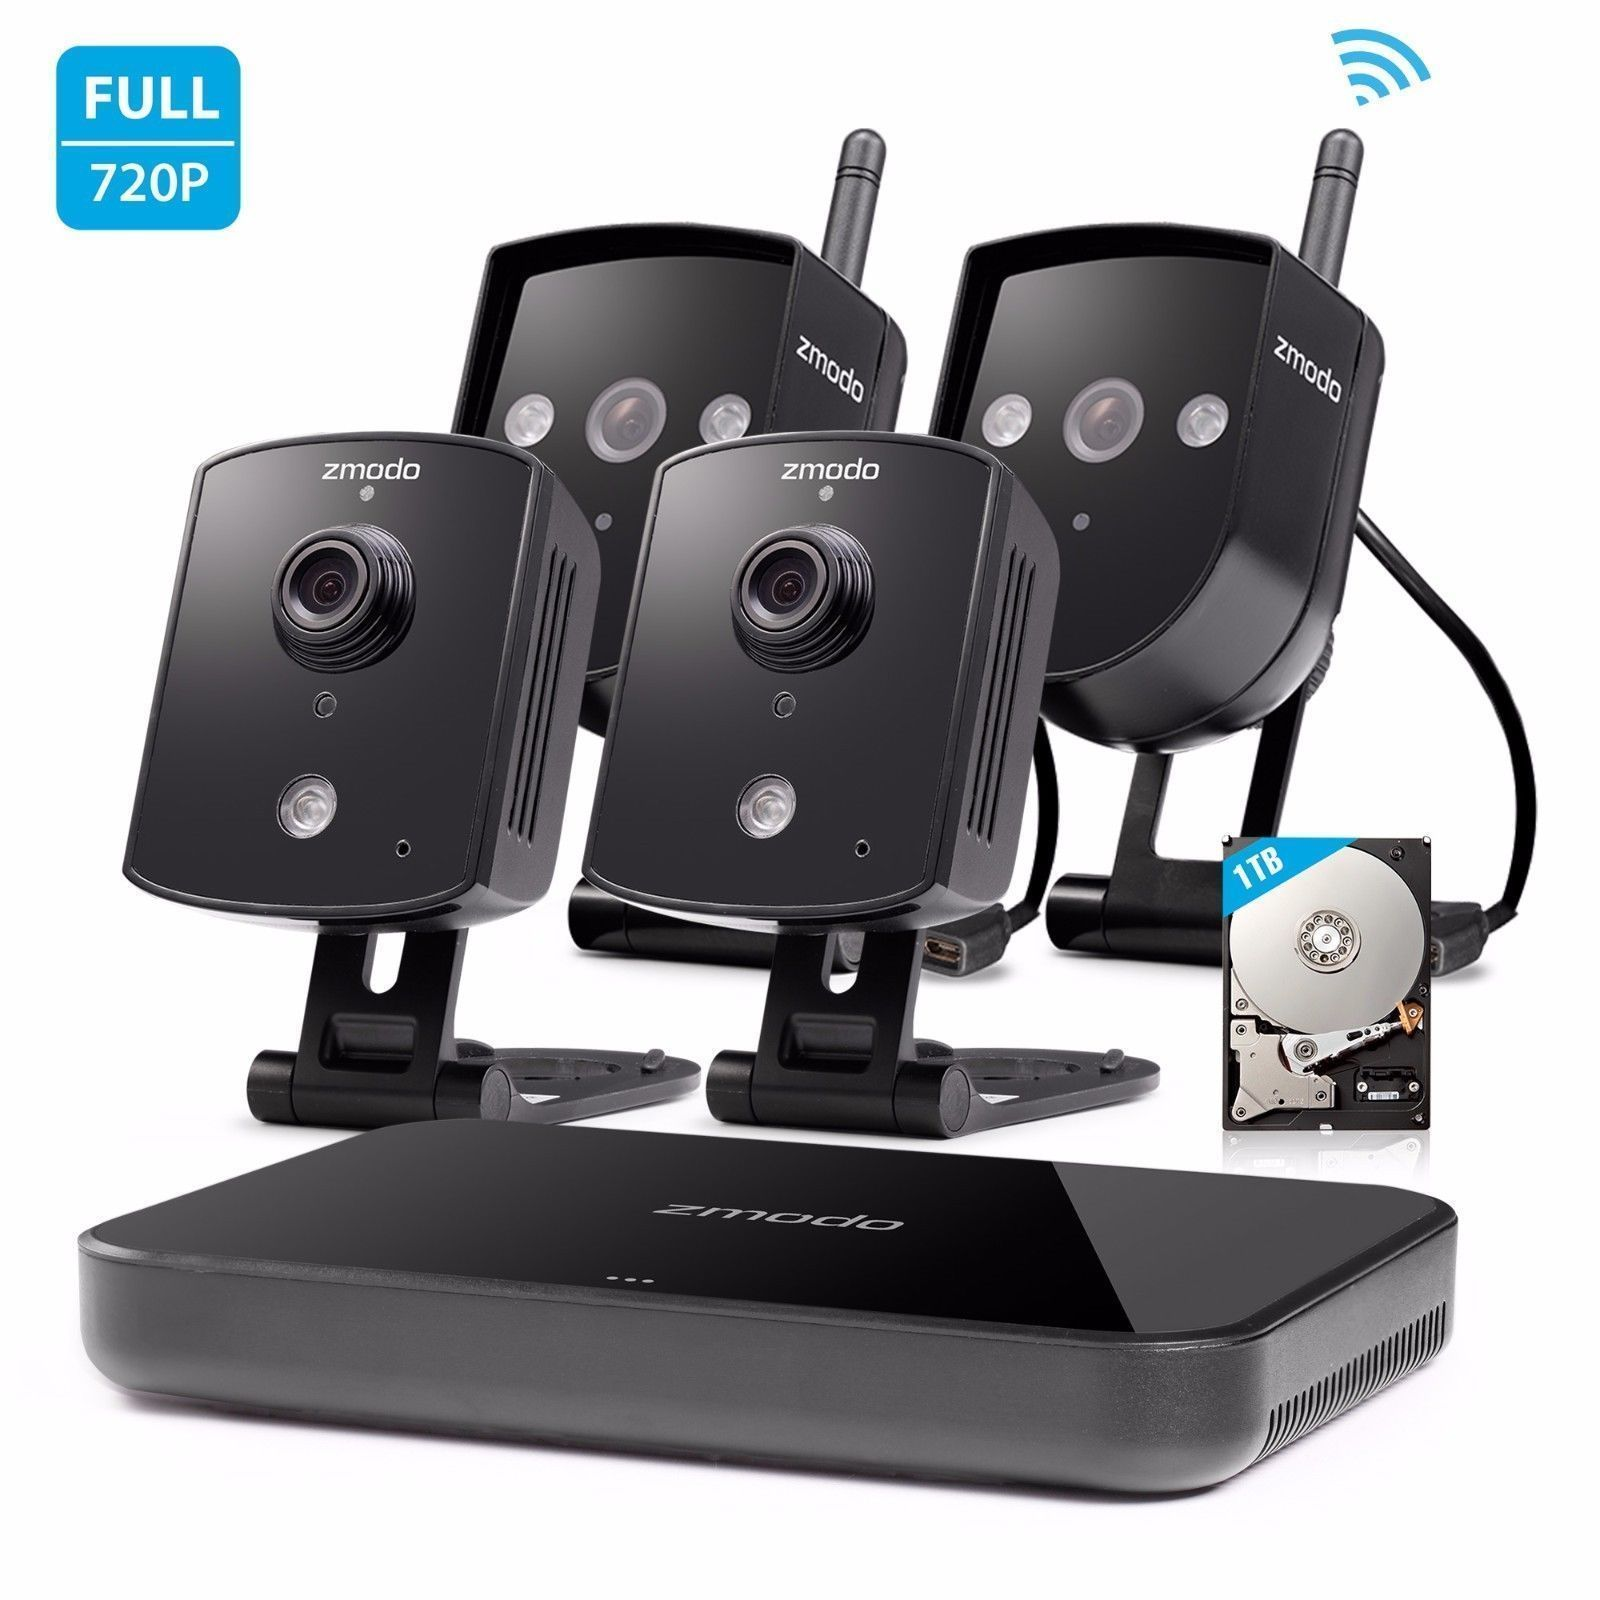 Zmodo 1080p HDMI NVR 4 720p Wireless IP Home Security Camera